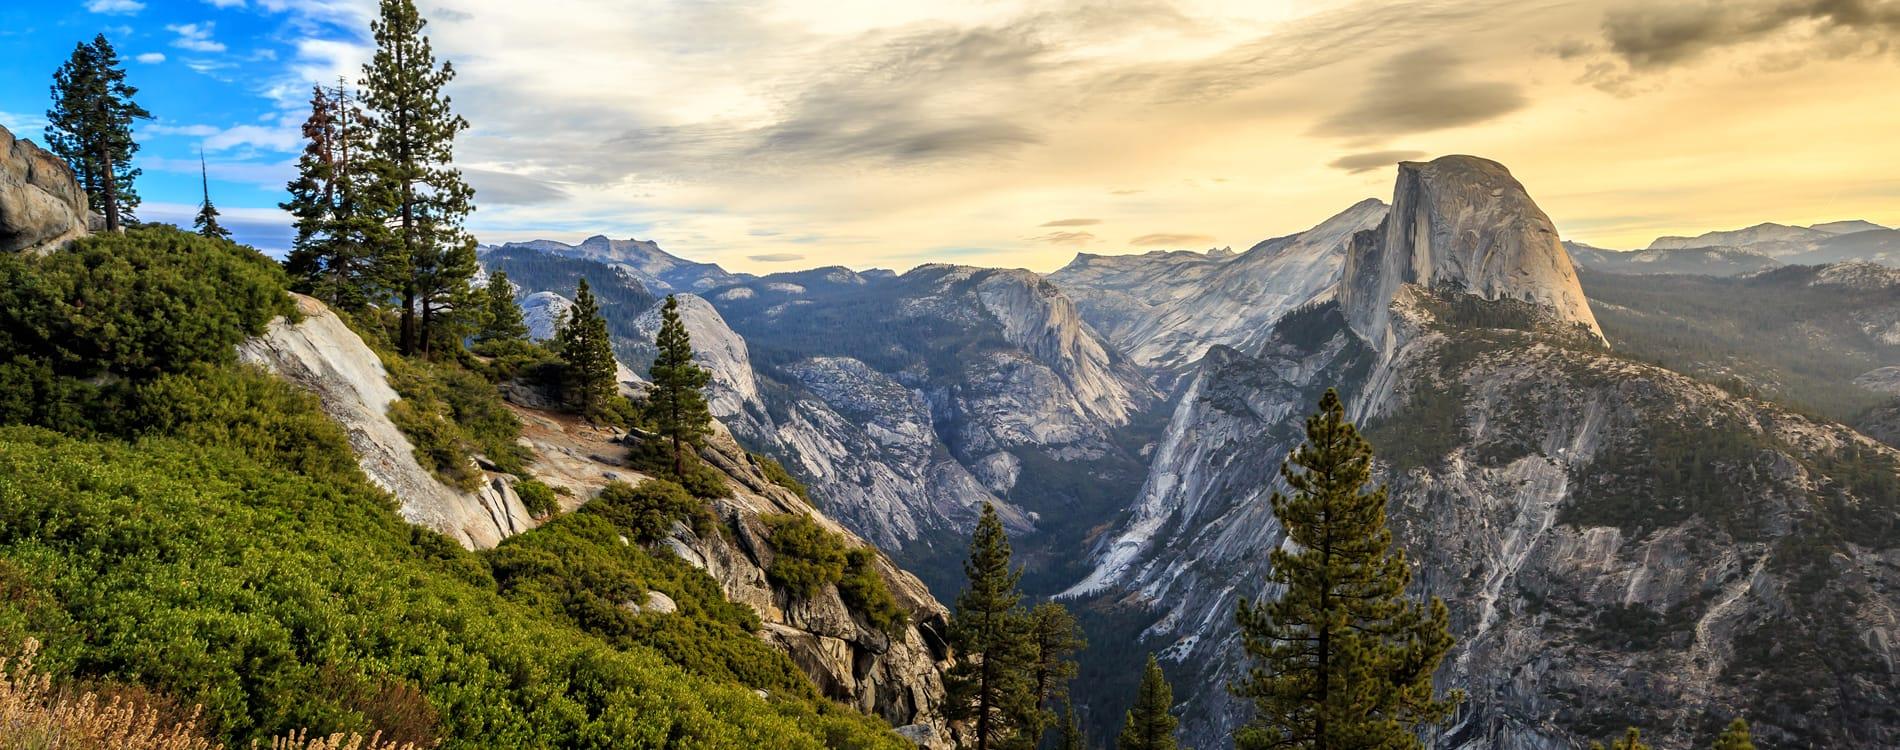 Yosemite National Park Cabin Rentals Amp Getaways All Cabins